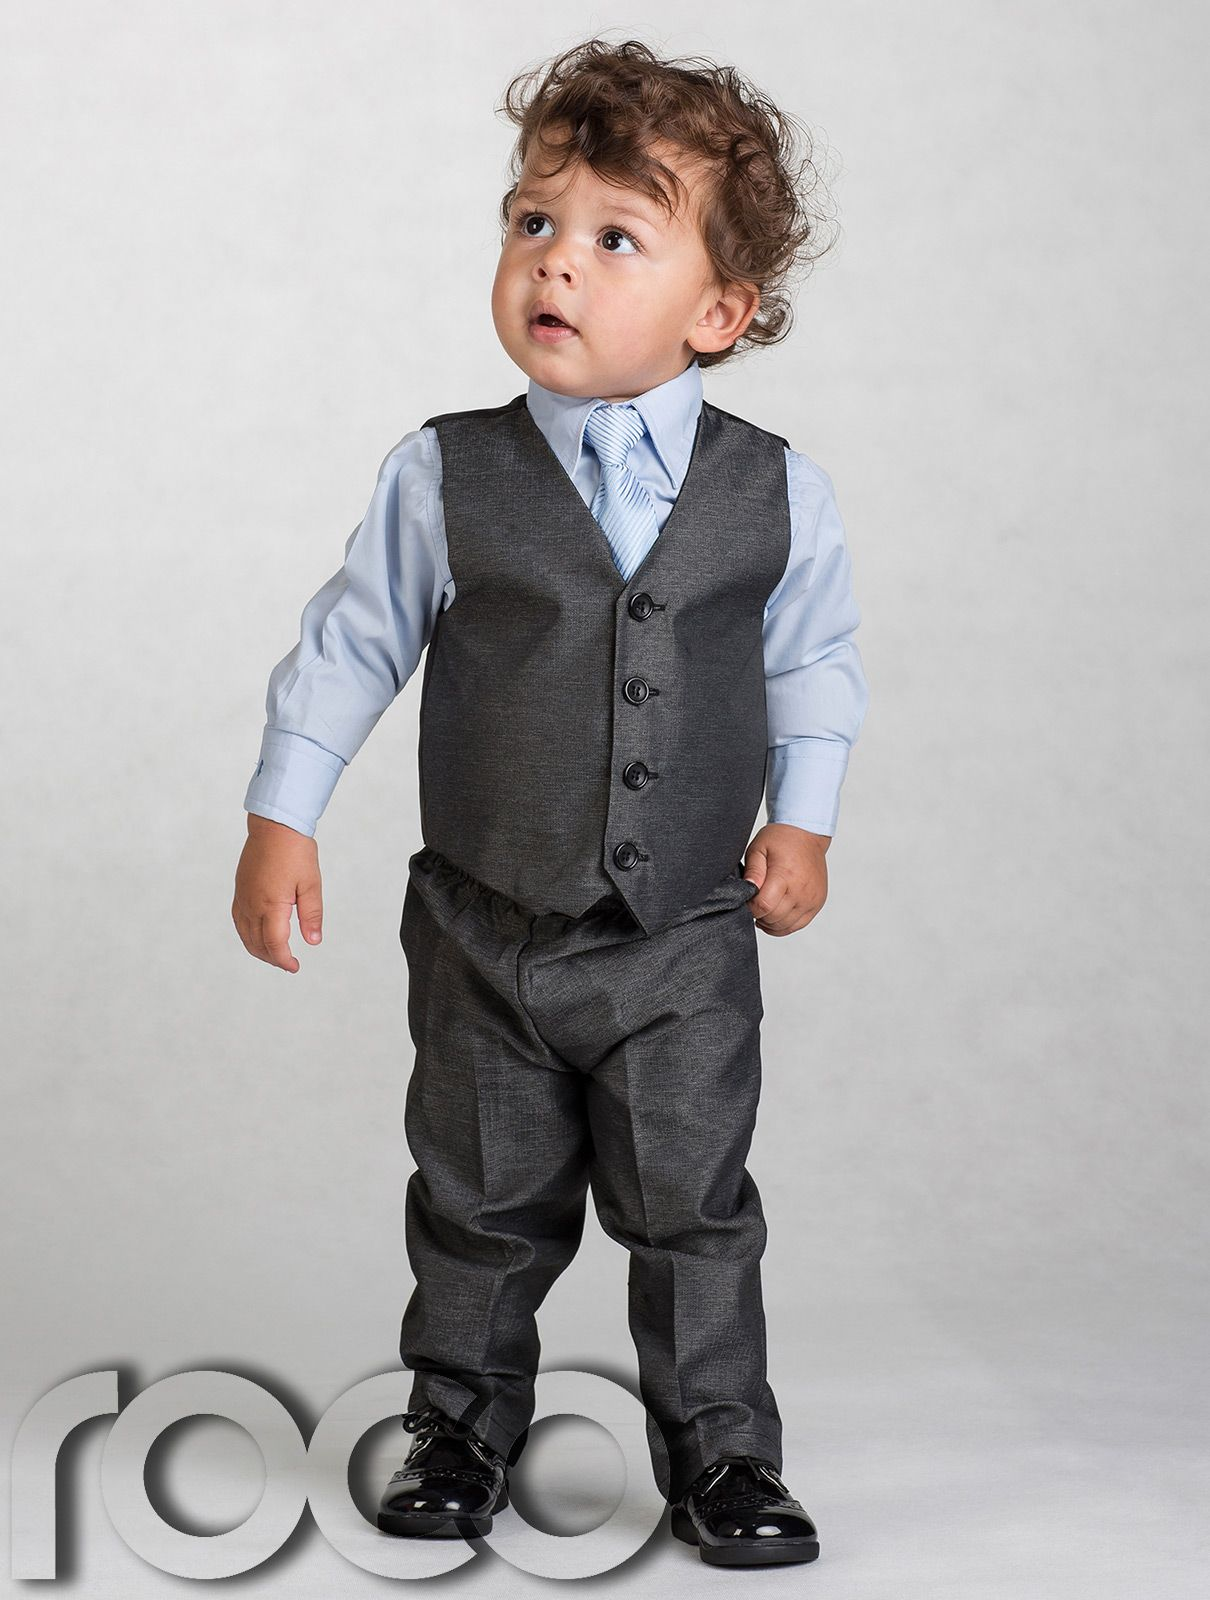 d4b08b7d1b51 Waistcoat Suit